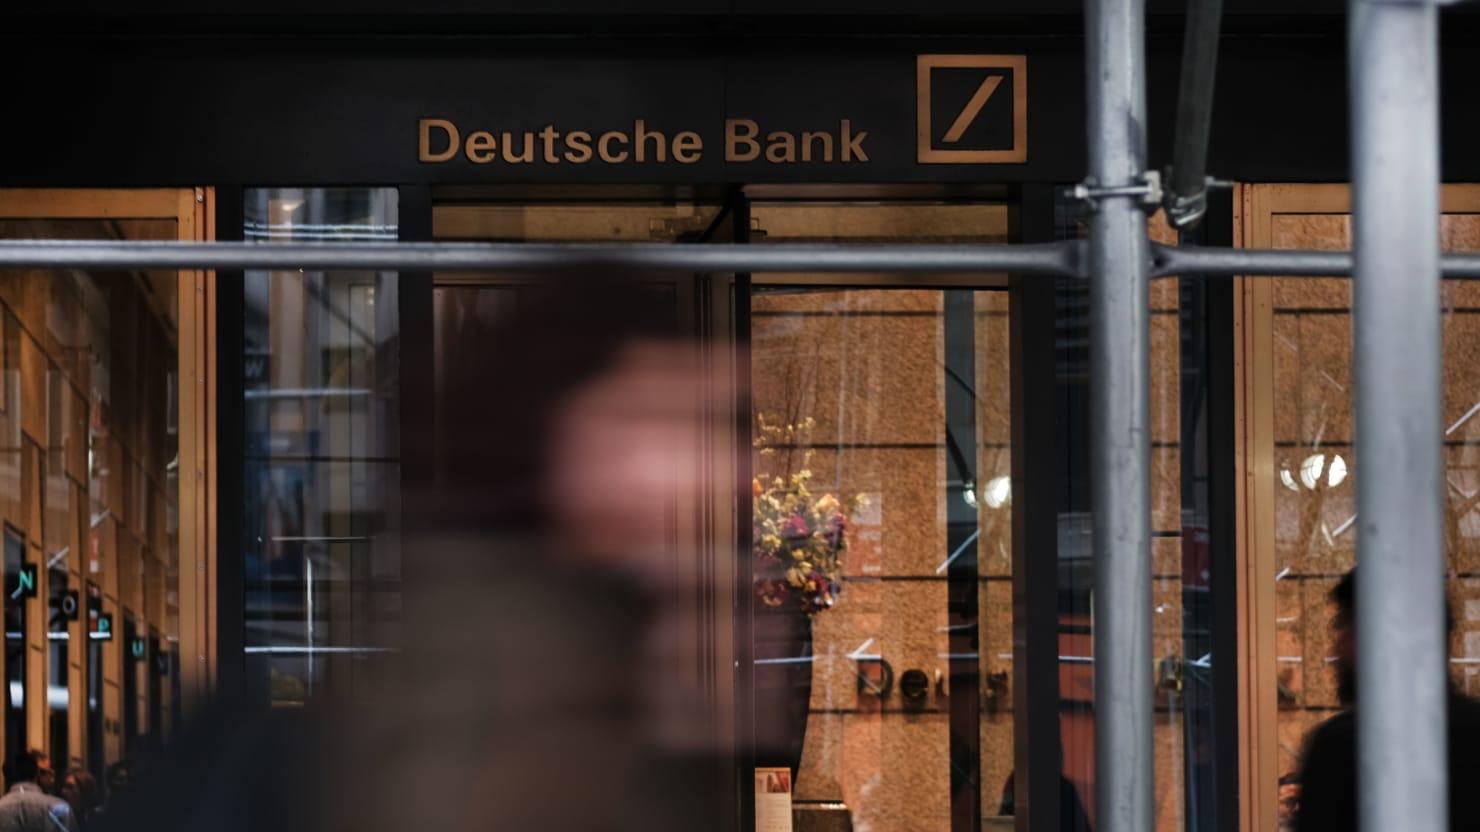 Deutsche Bank Under Investigation for 'Potential Money-Laundering Lapses': NYT